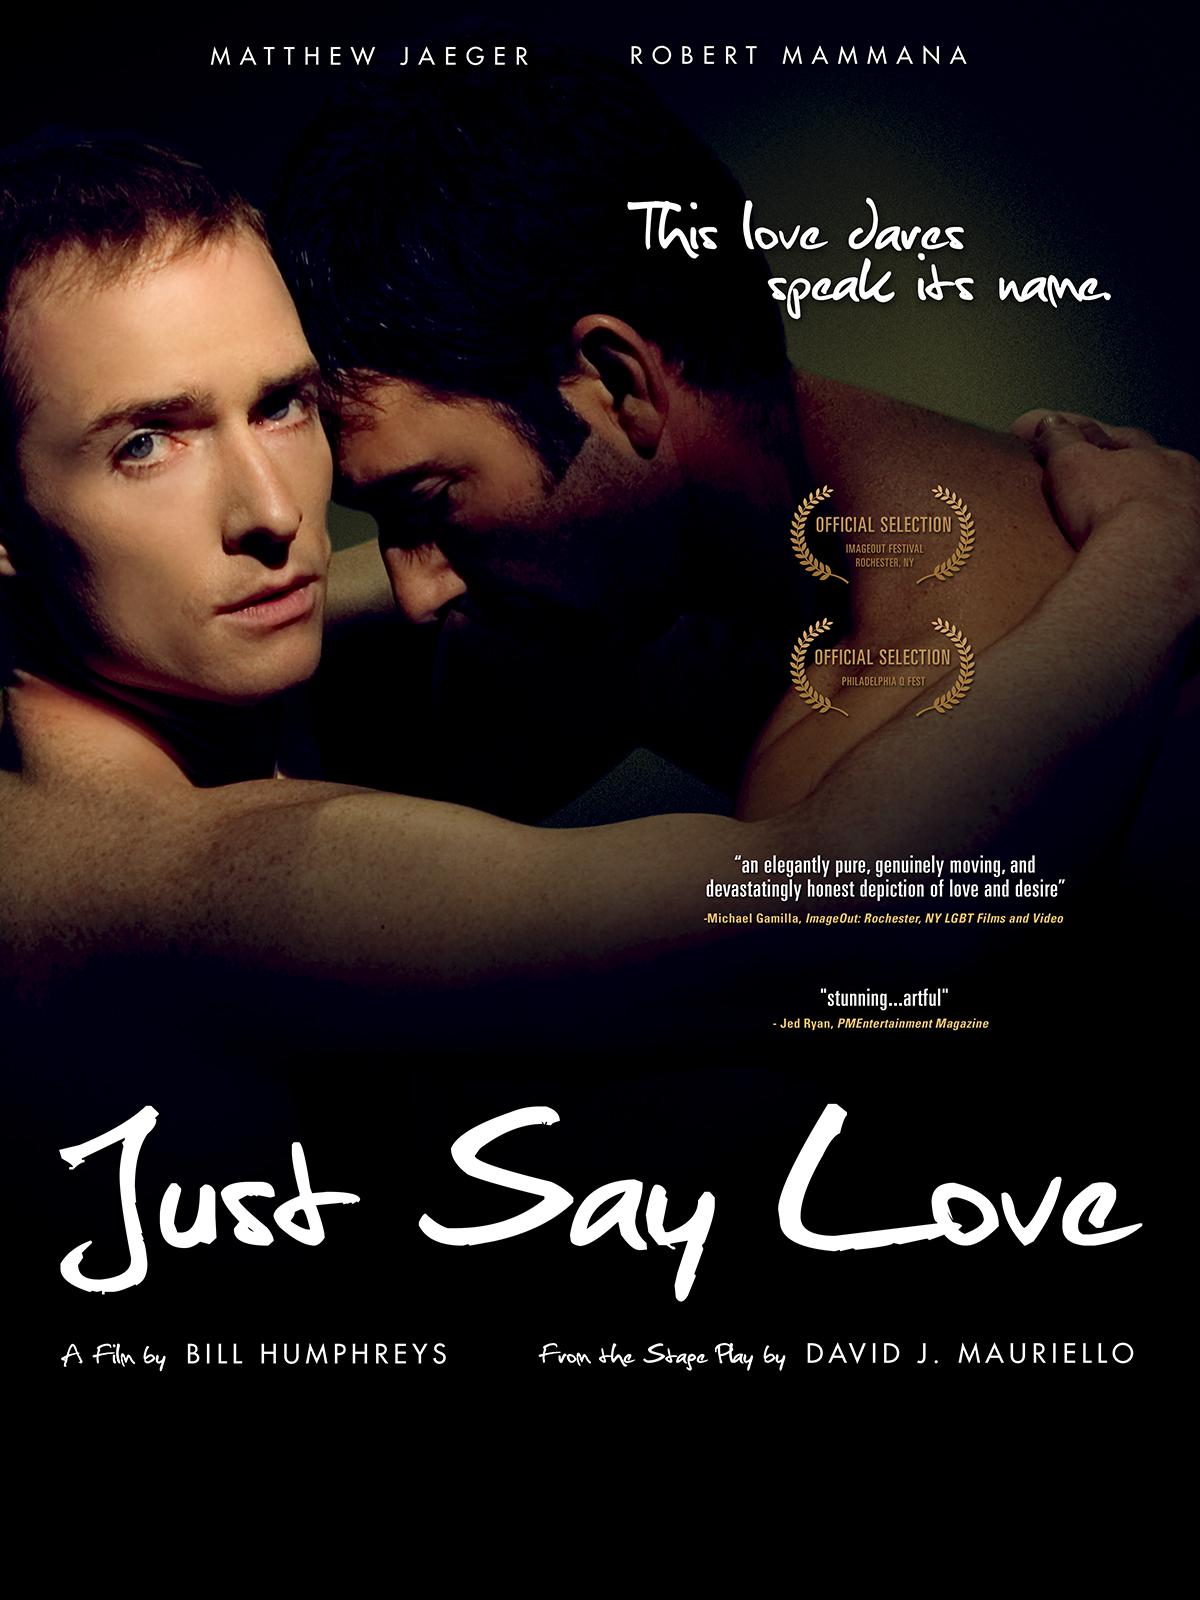 Here-JustSayLove-Full-Image-en-US.jpg